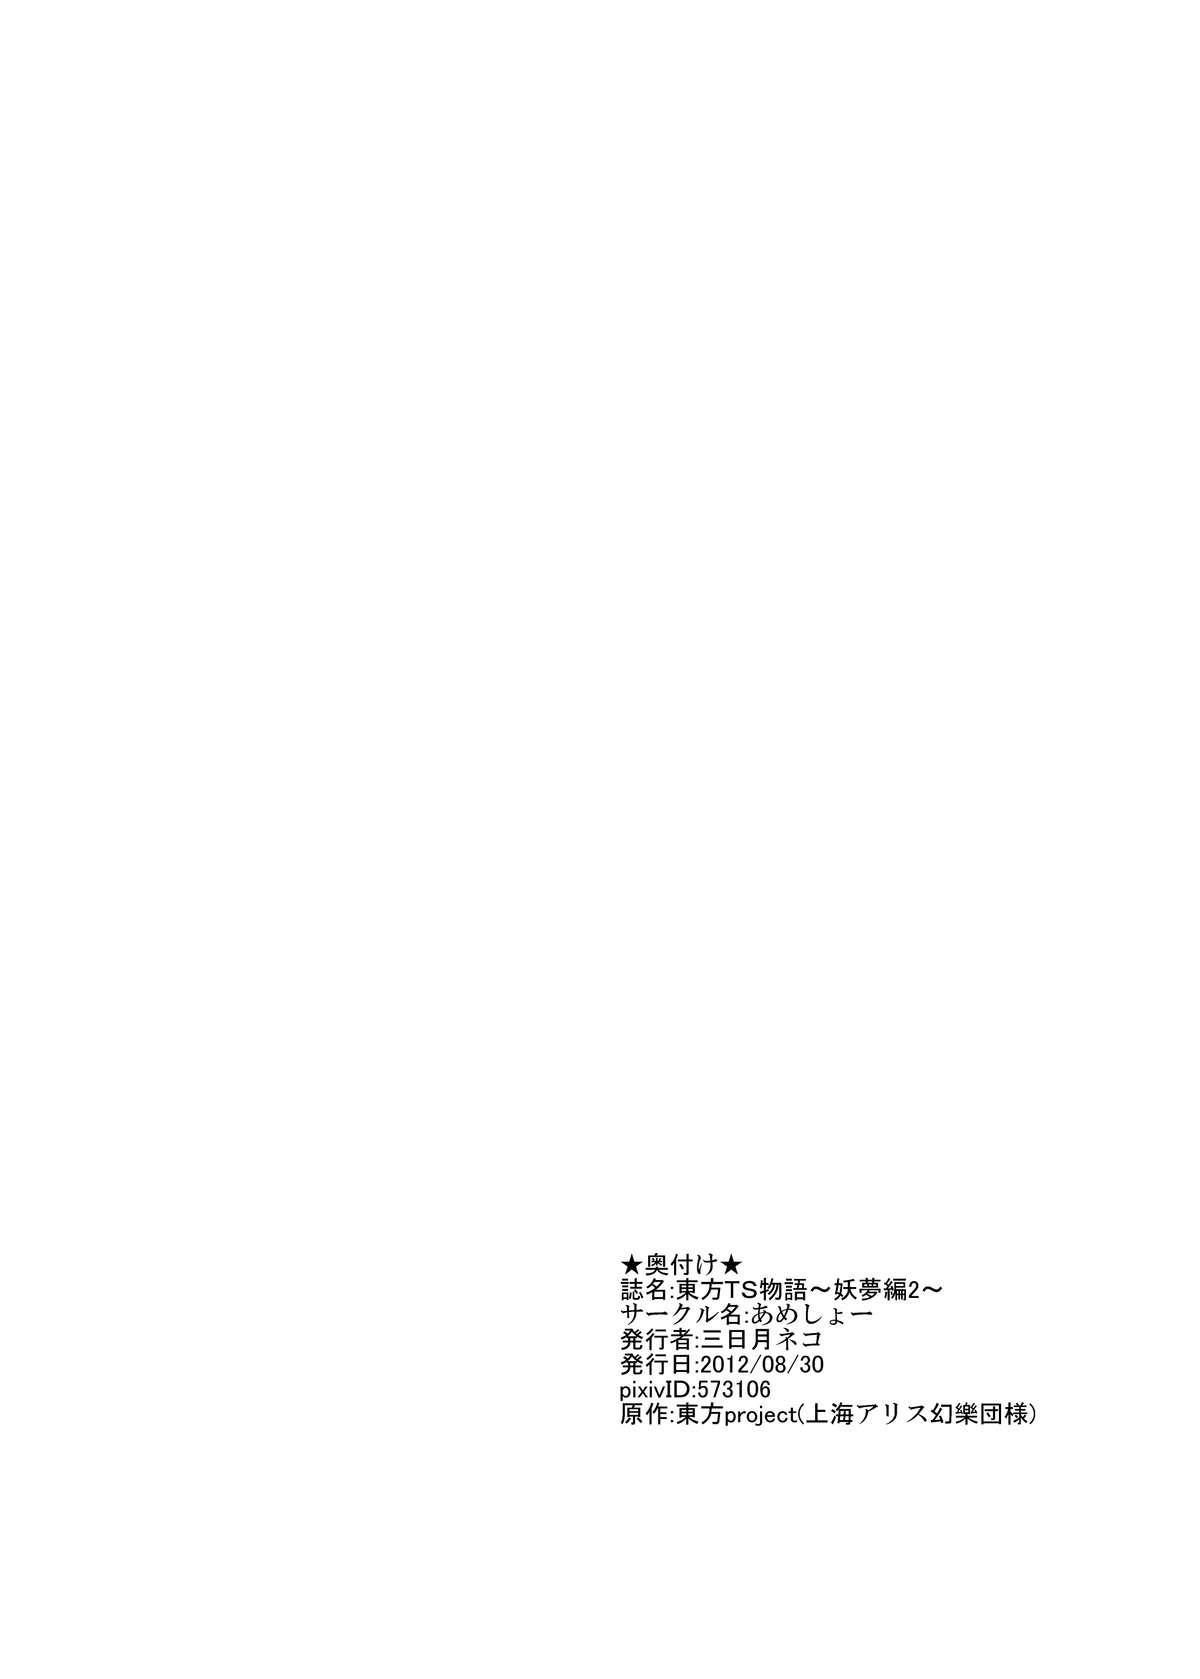 Touhou TS monogatari 37